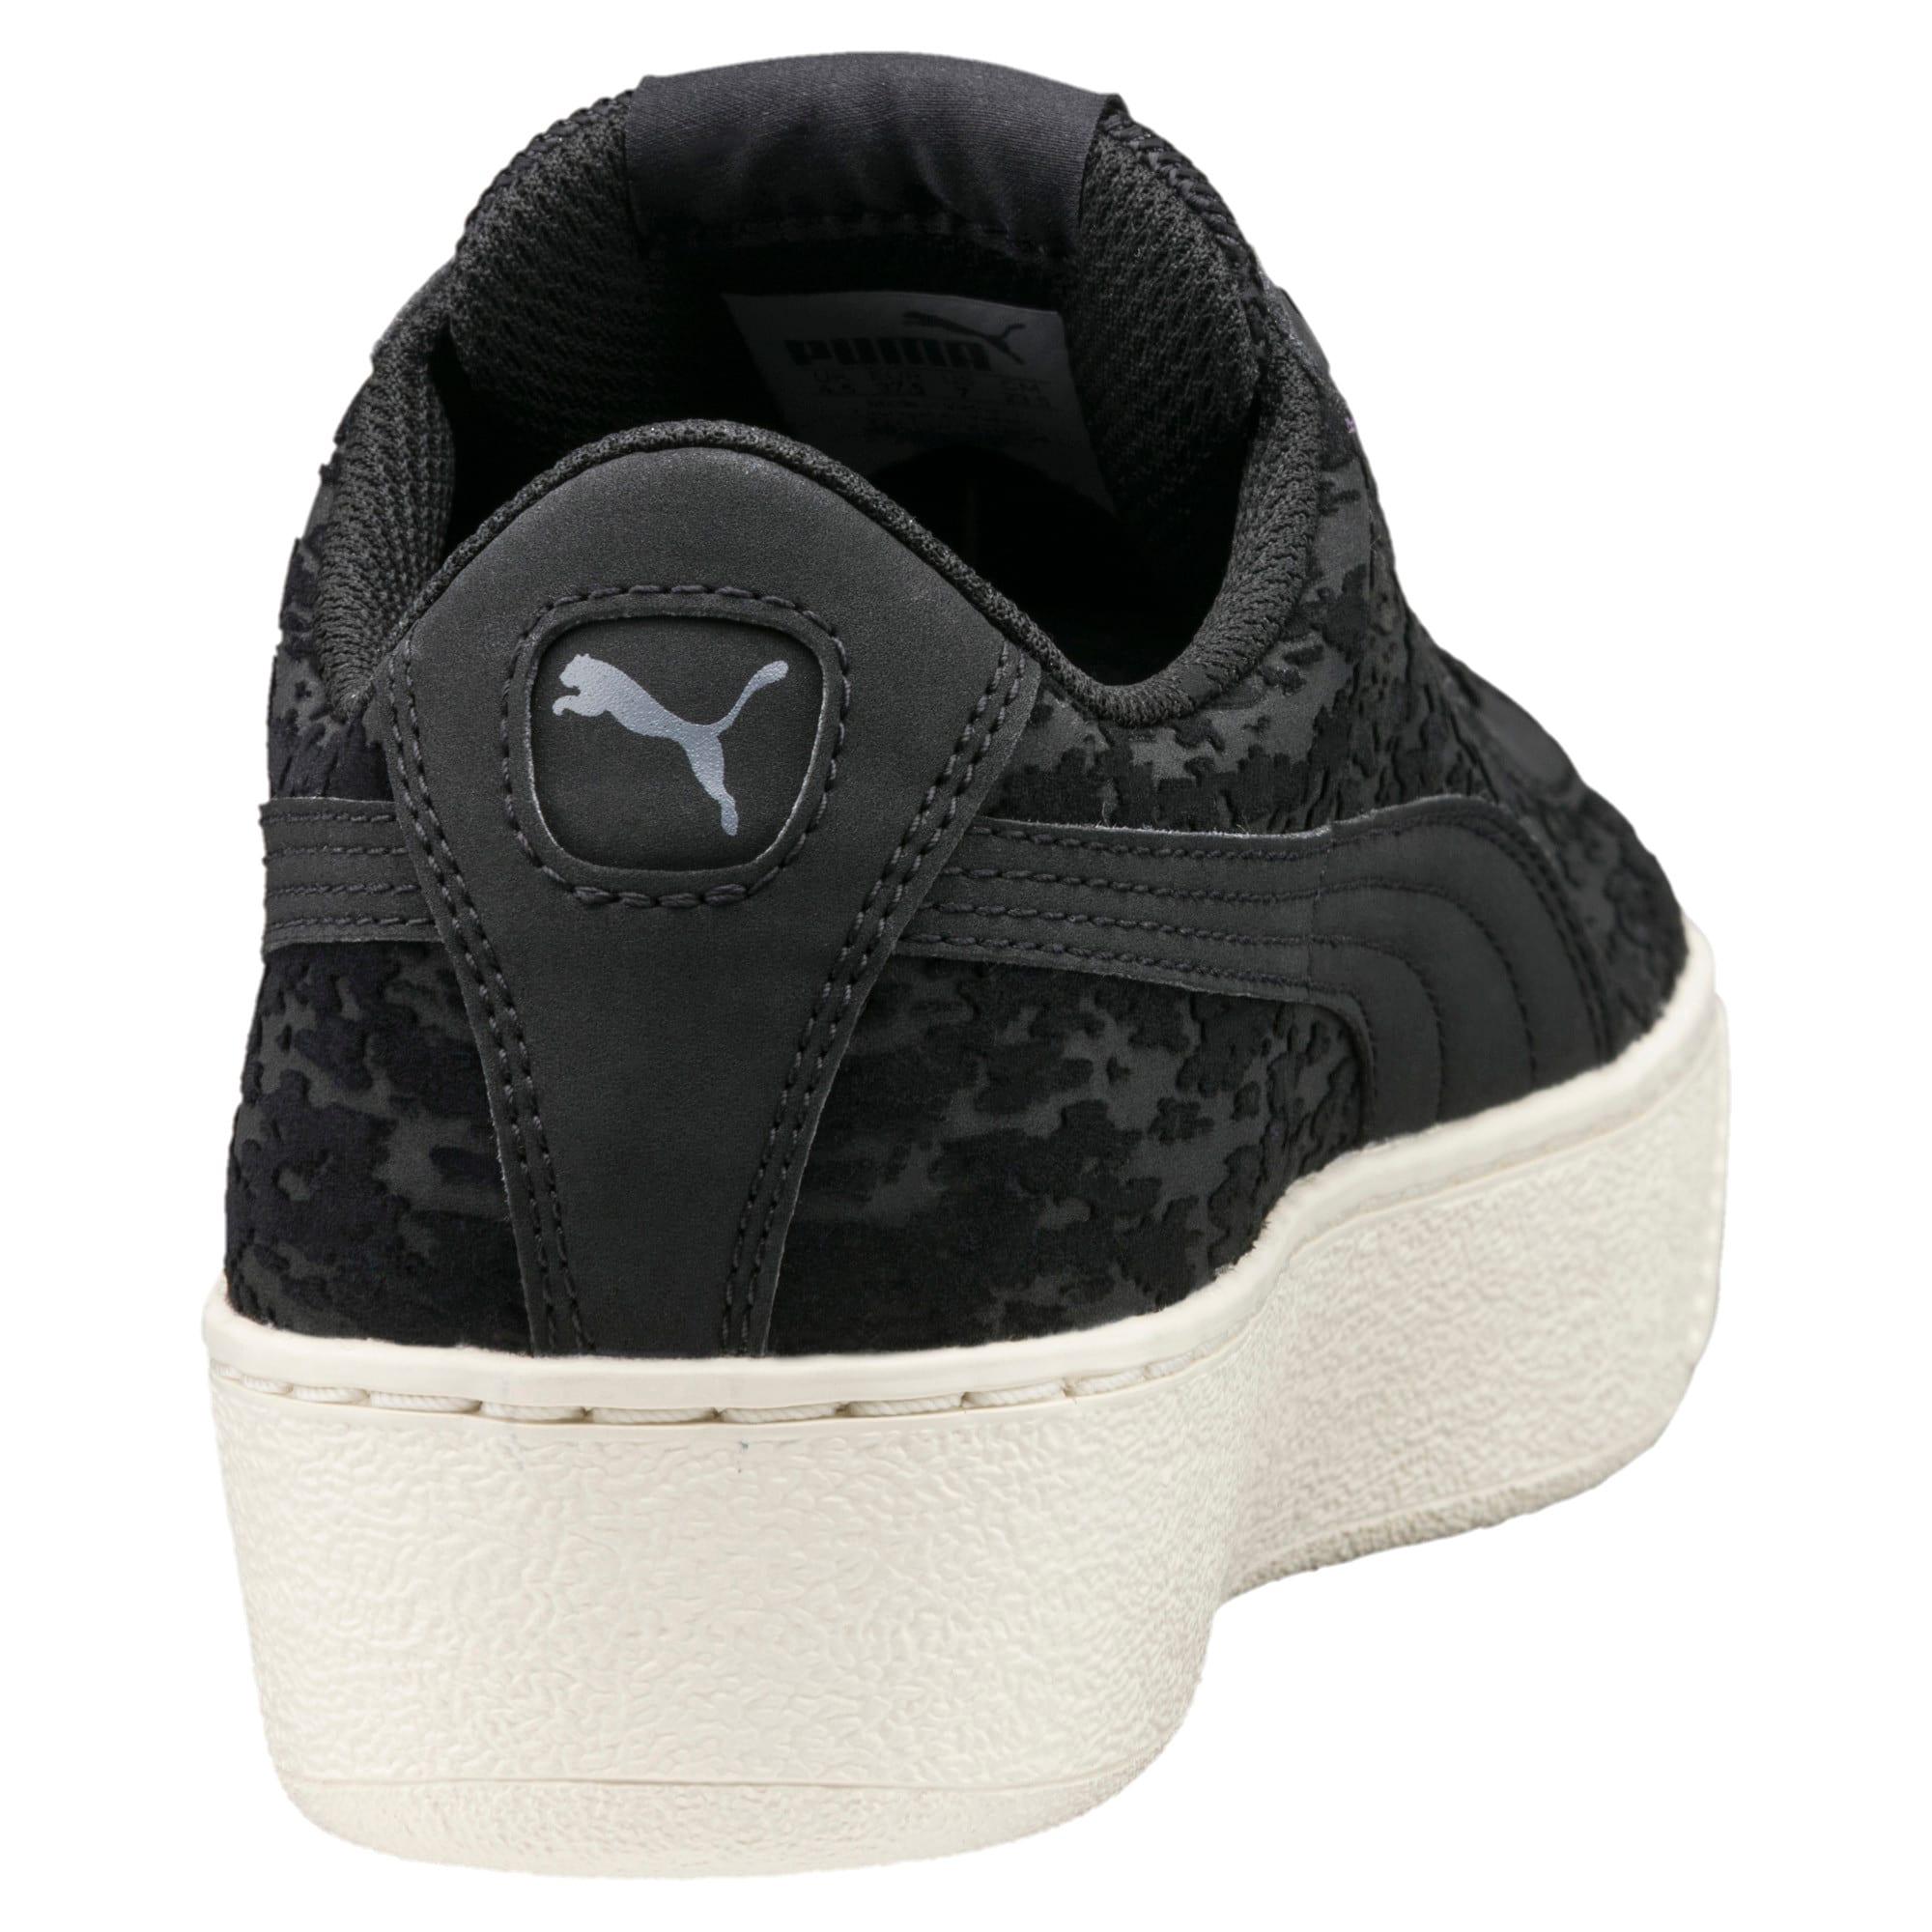 Thumbnail 4 of Vikky Platform Velvet Rope Women's Sneakers, Puma Black-Puma Black, medium